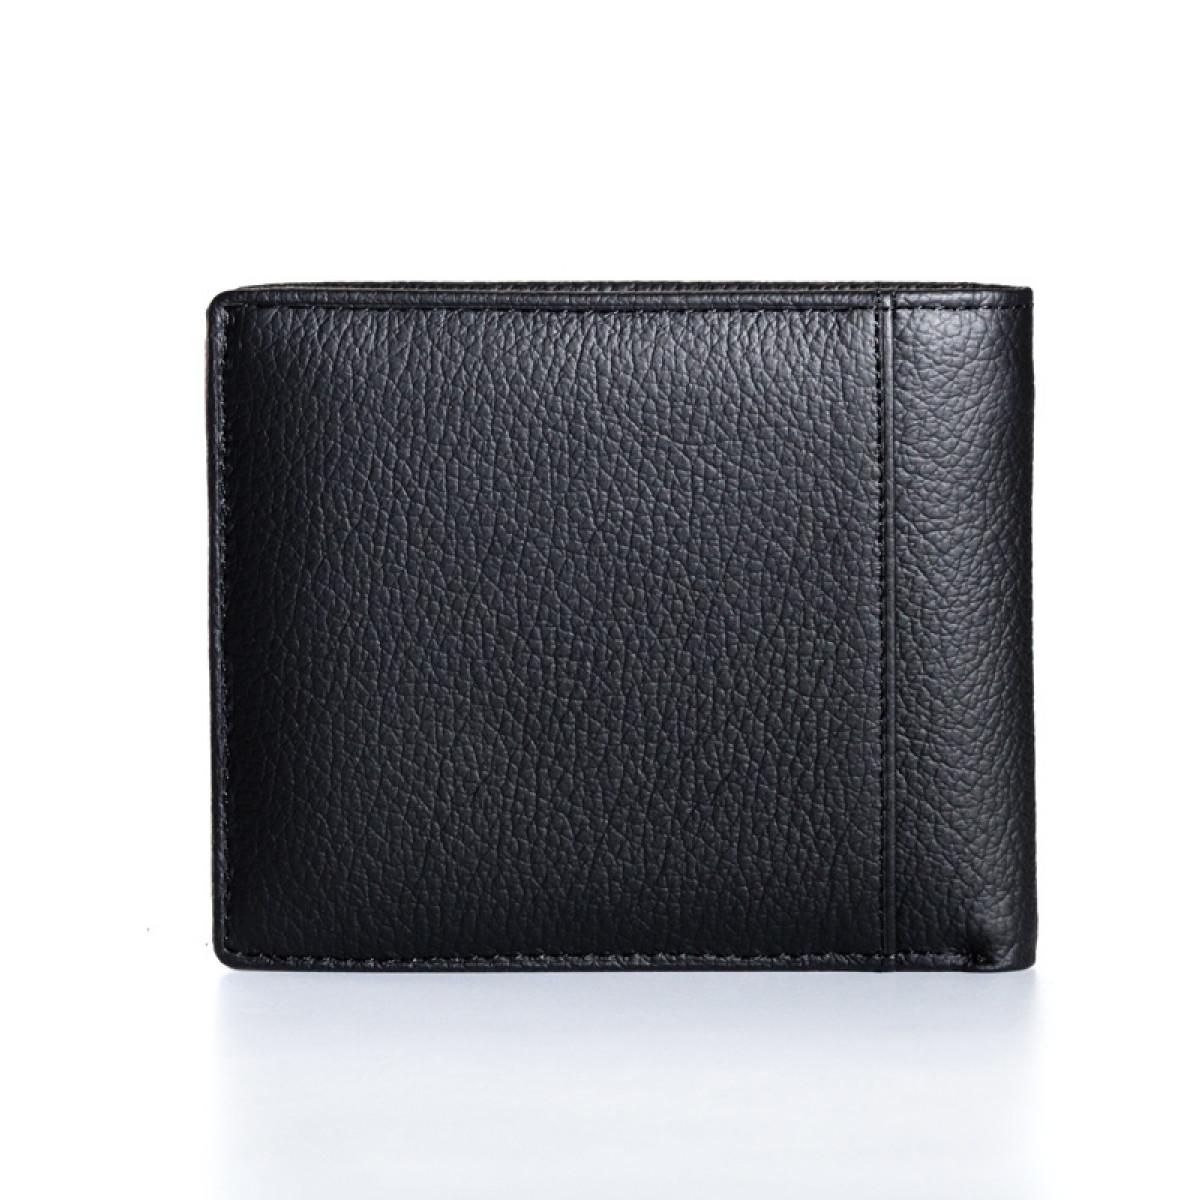 Moška usnjena denarnica Johny_5